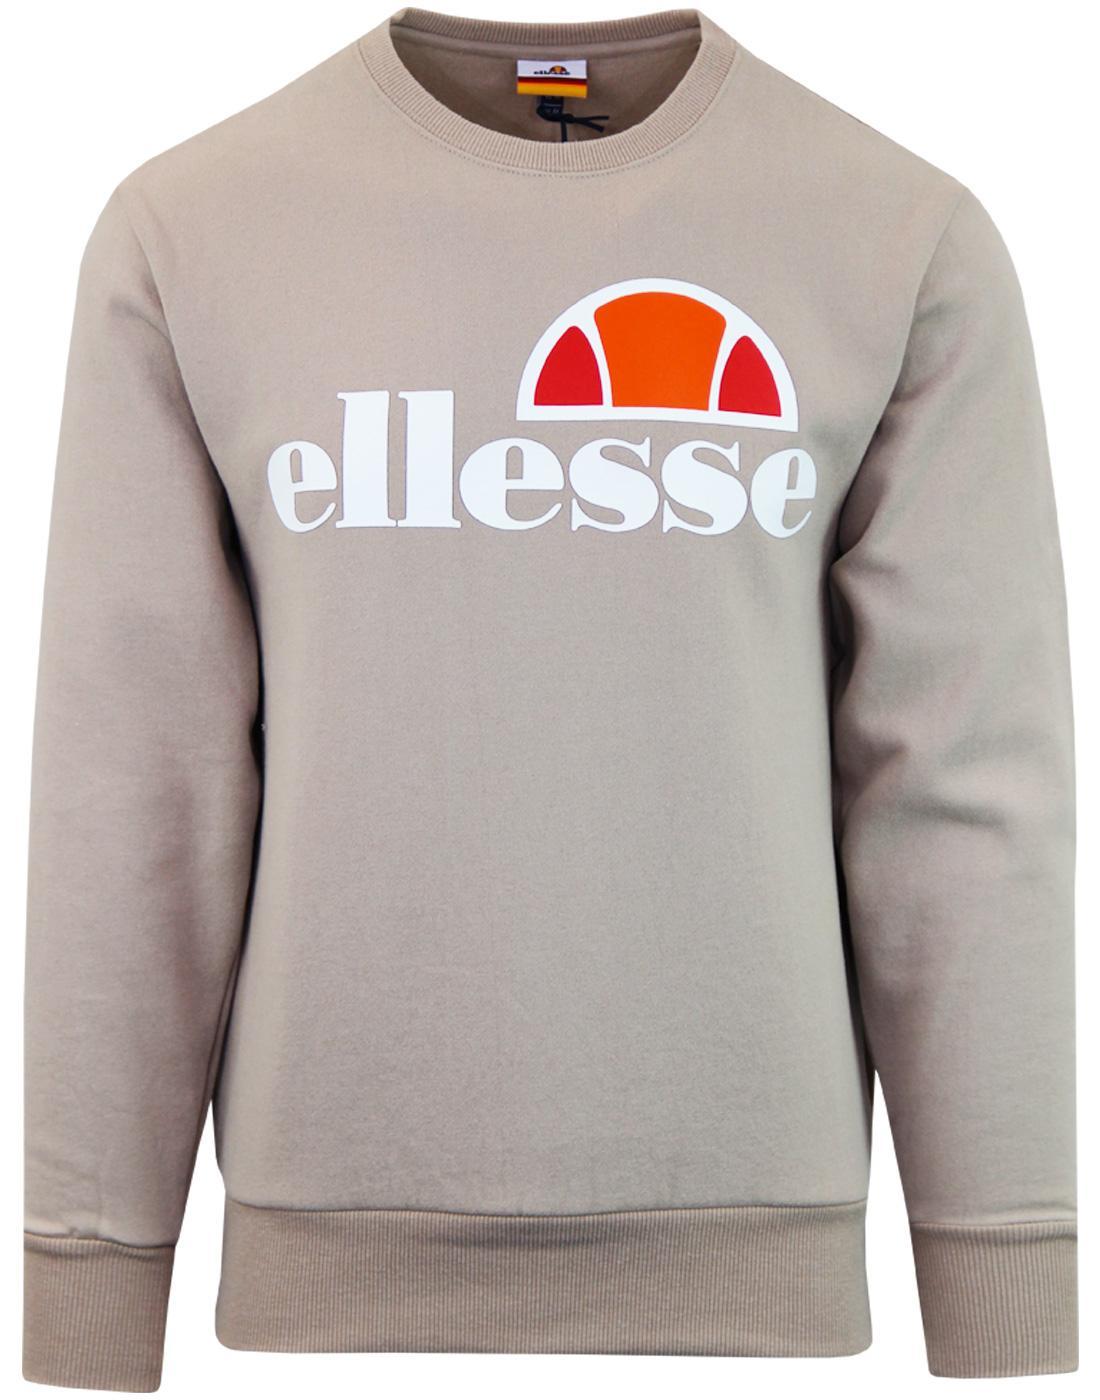 Succiso ELLESSE Retro 70s Crew Neck Sweatshirt (A)